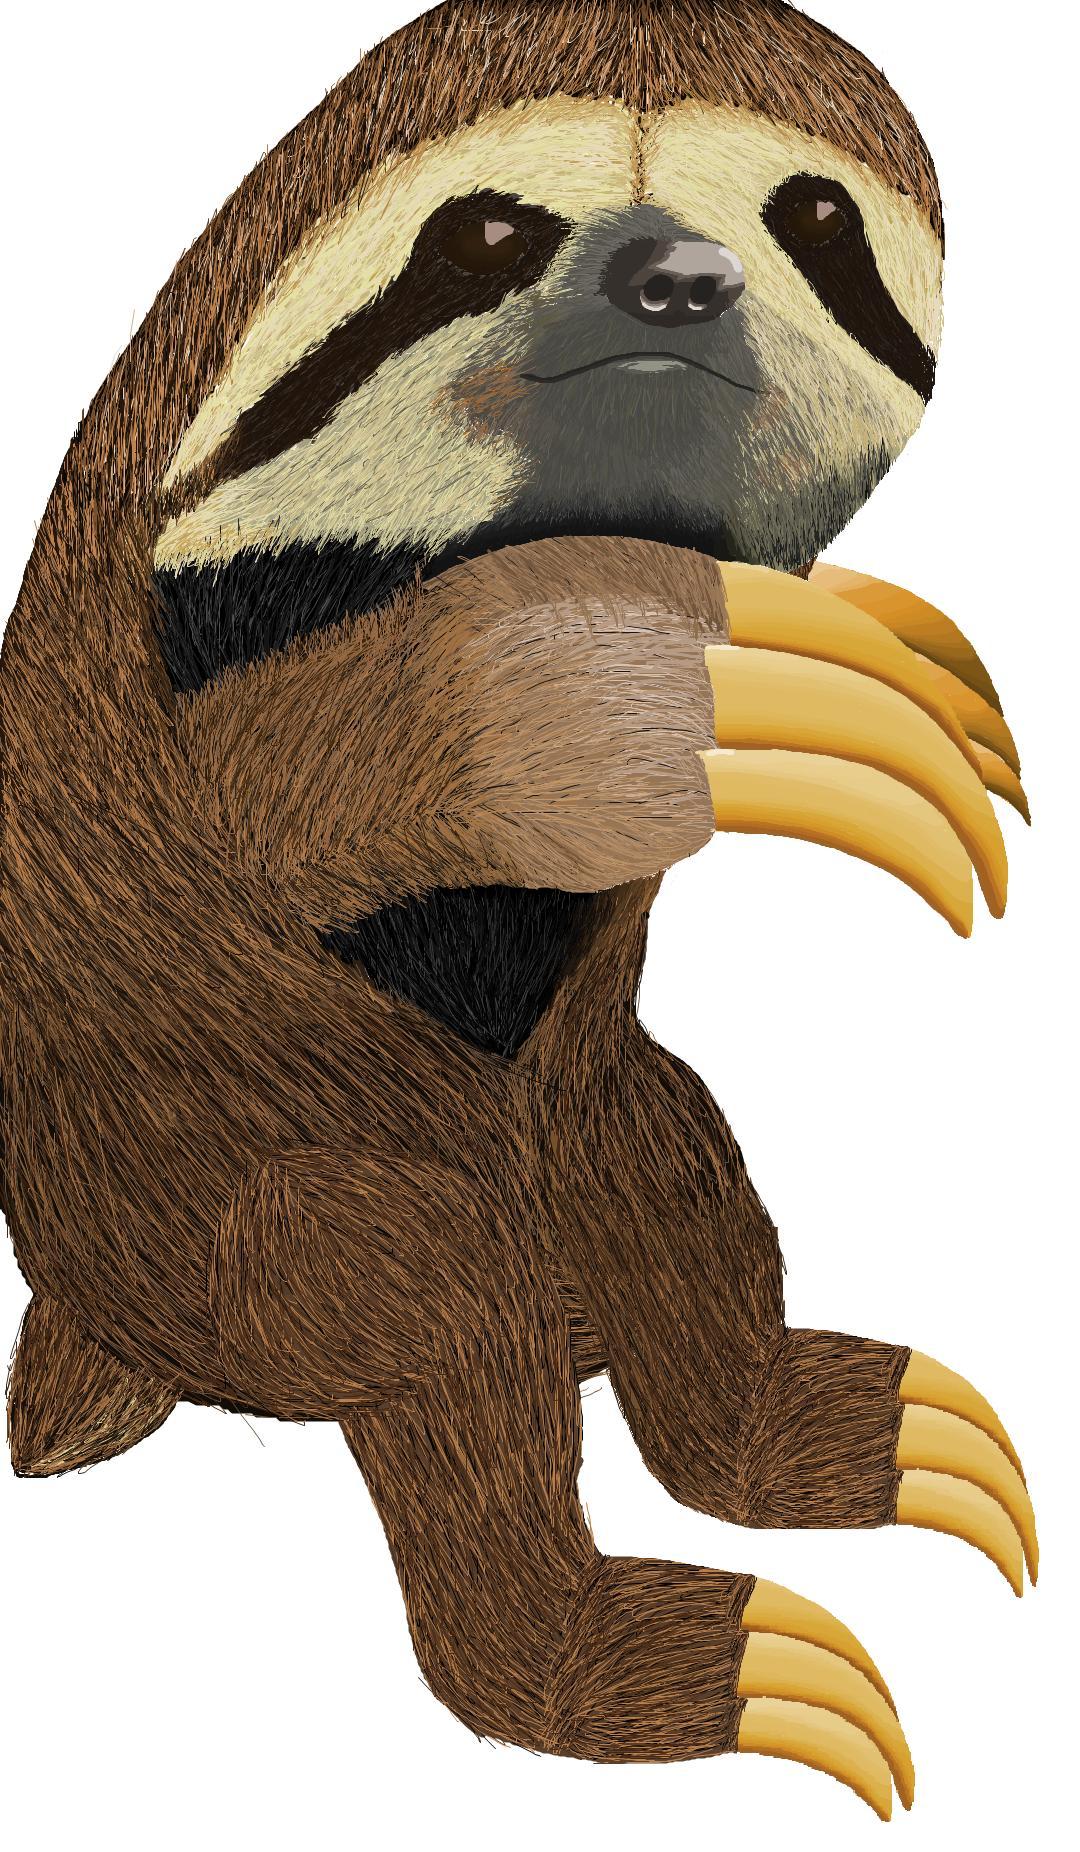 MS Paint sloth